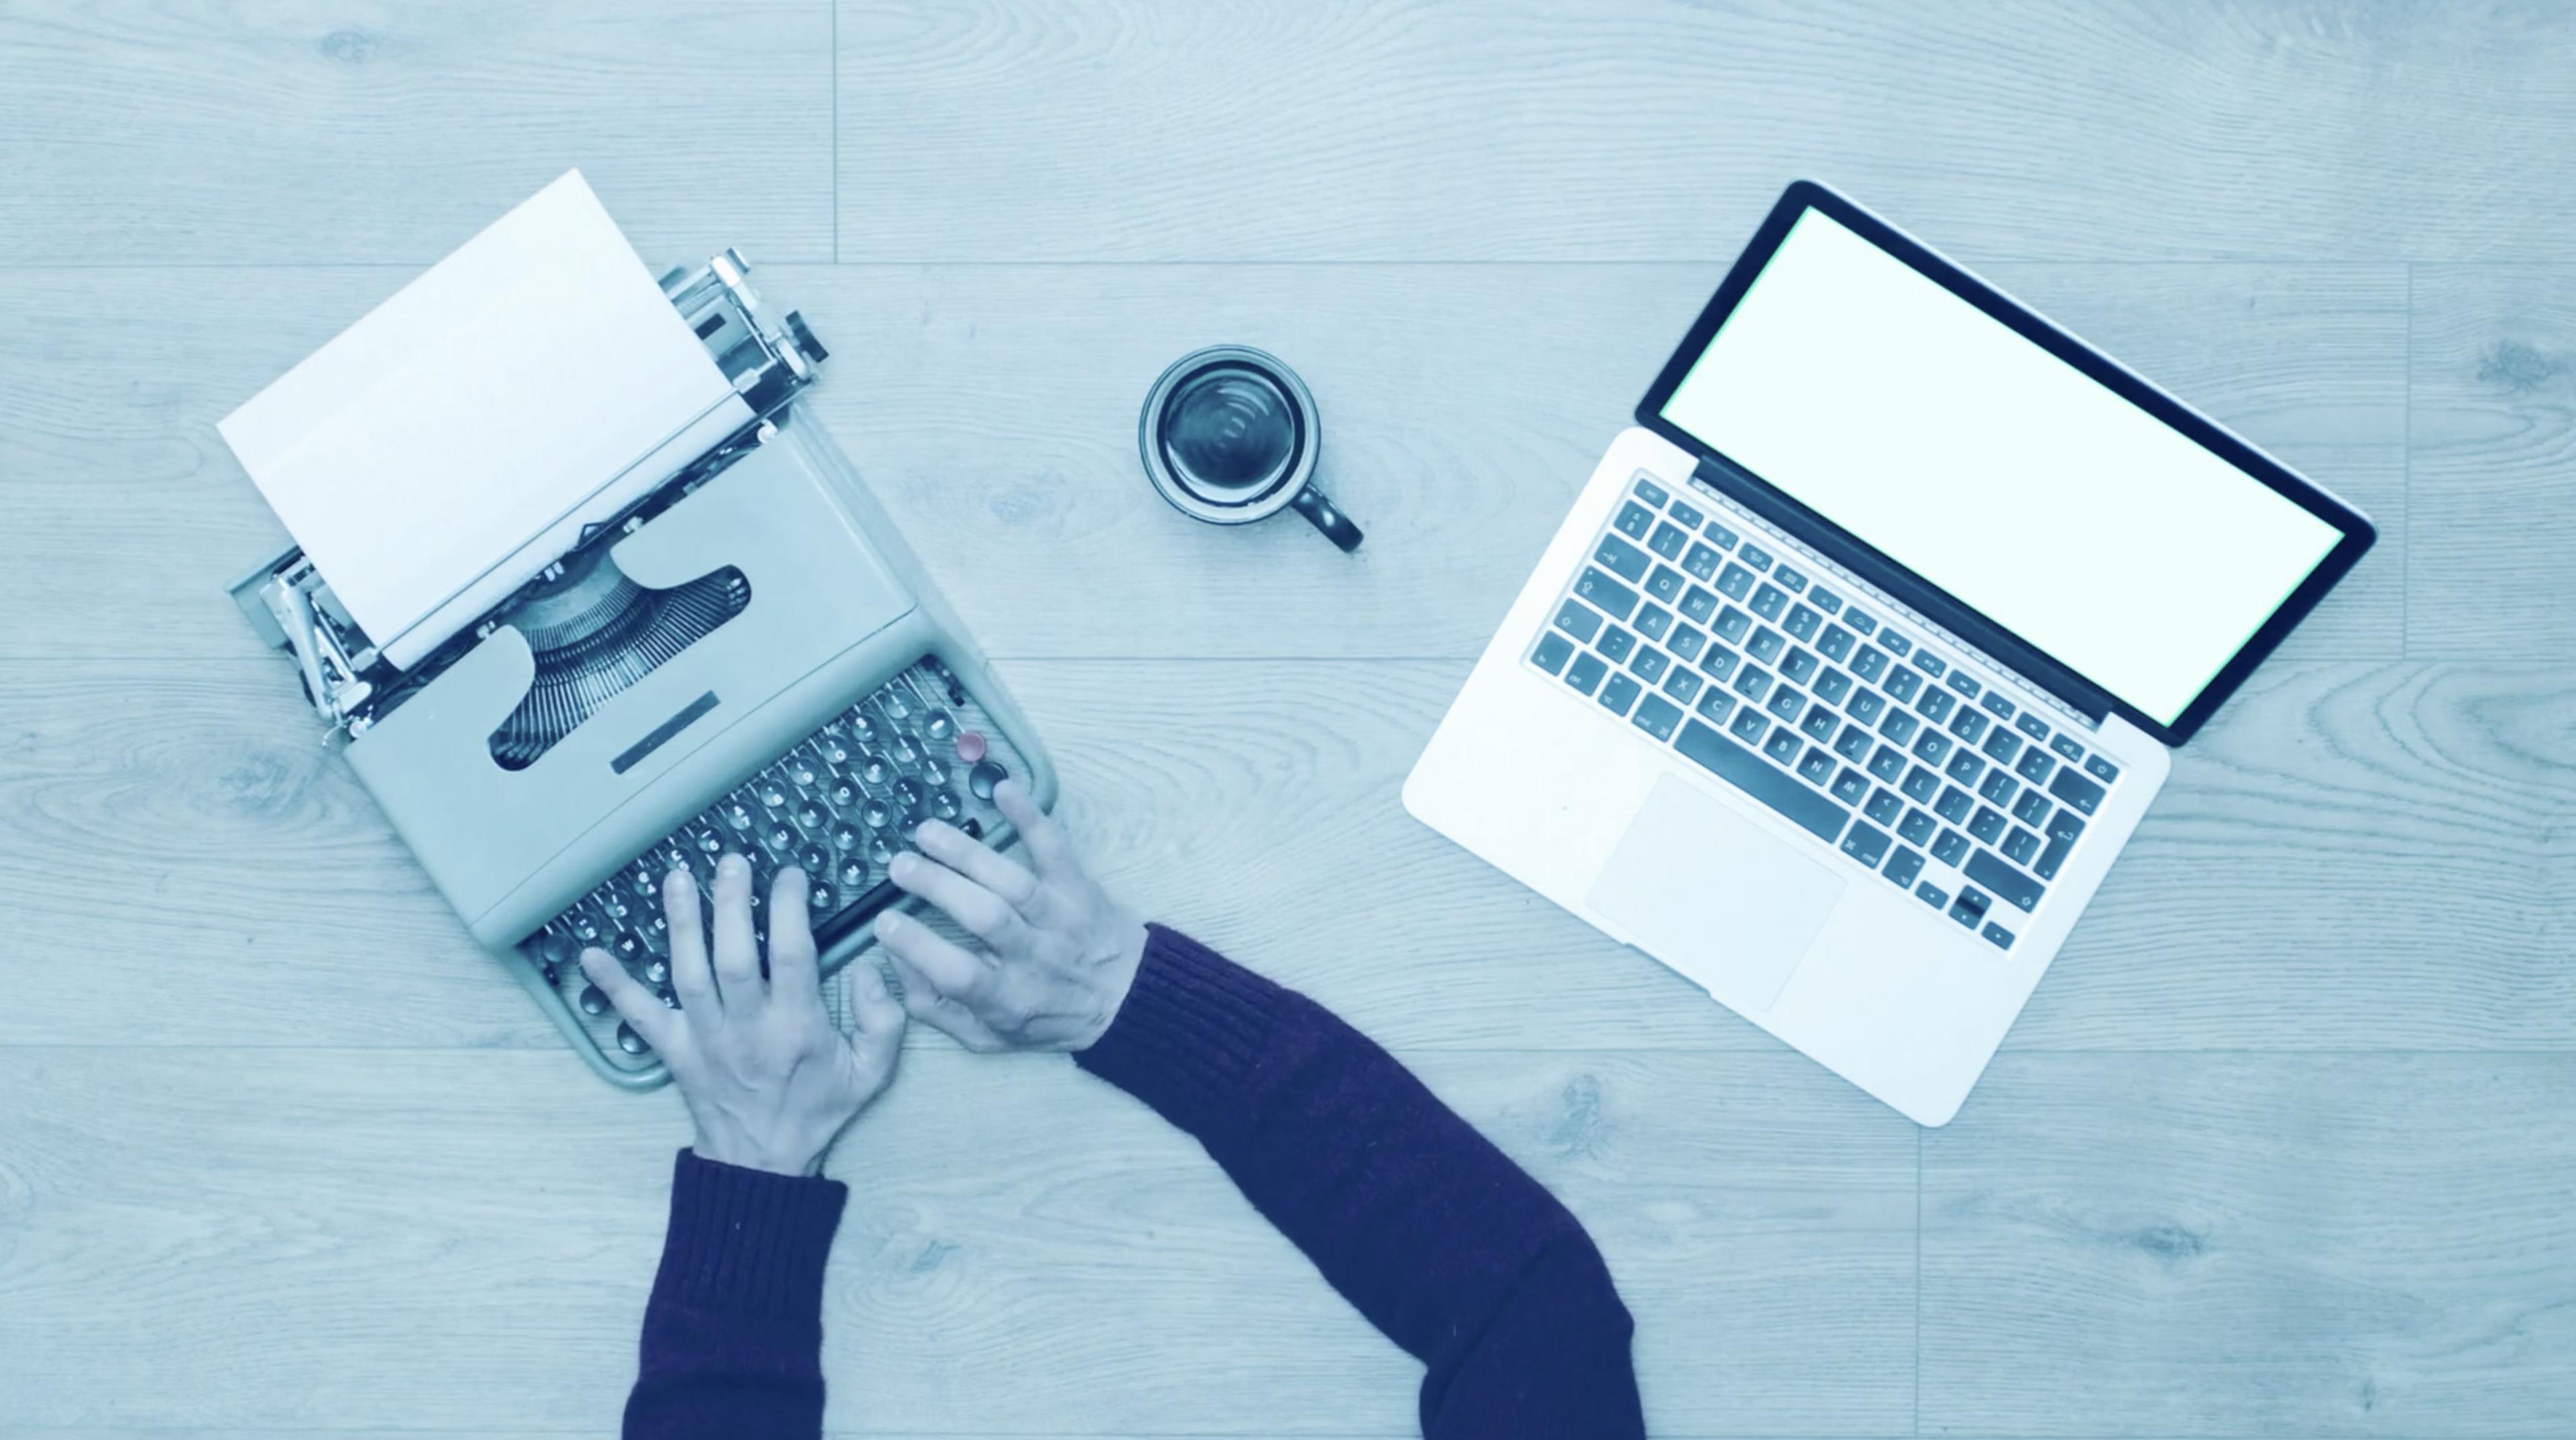 blogger hands at typewriter